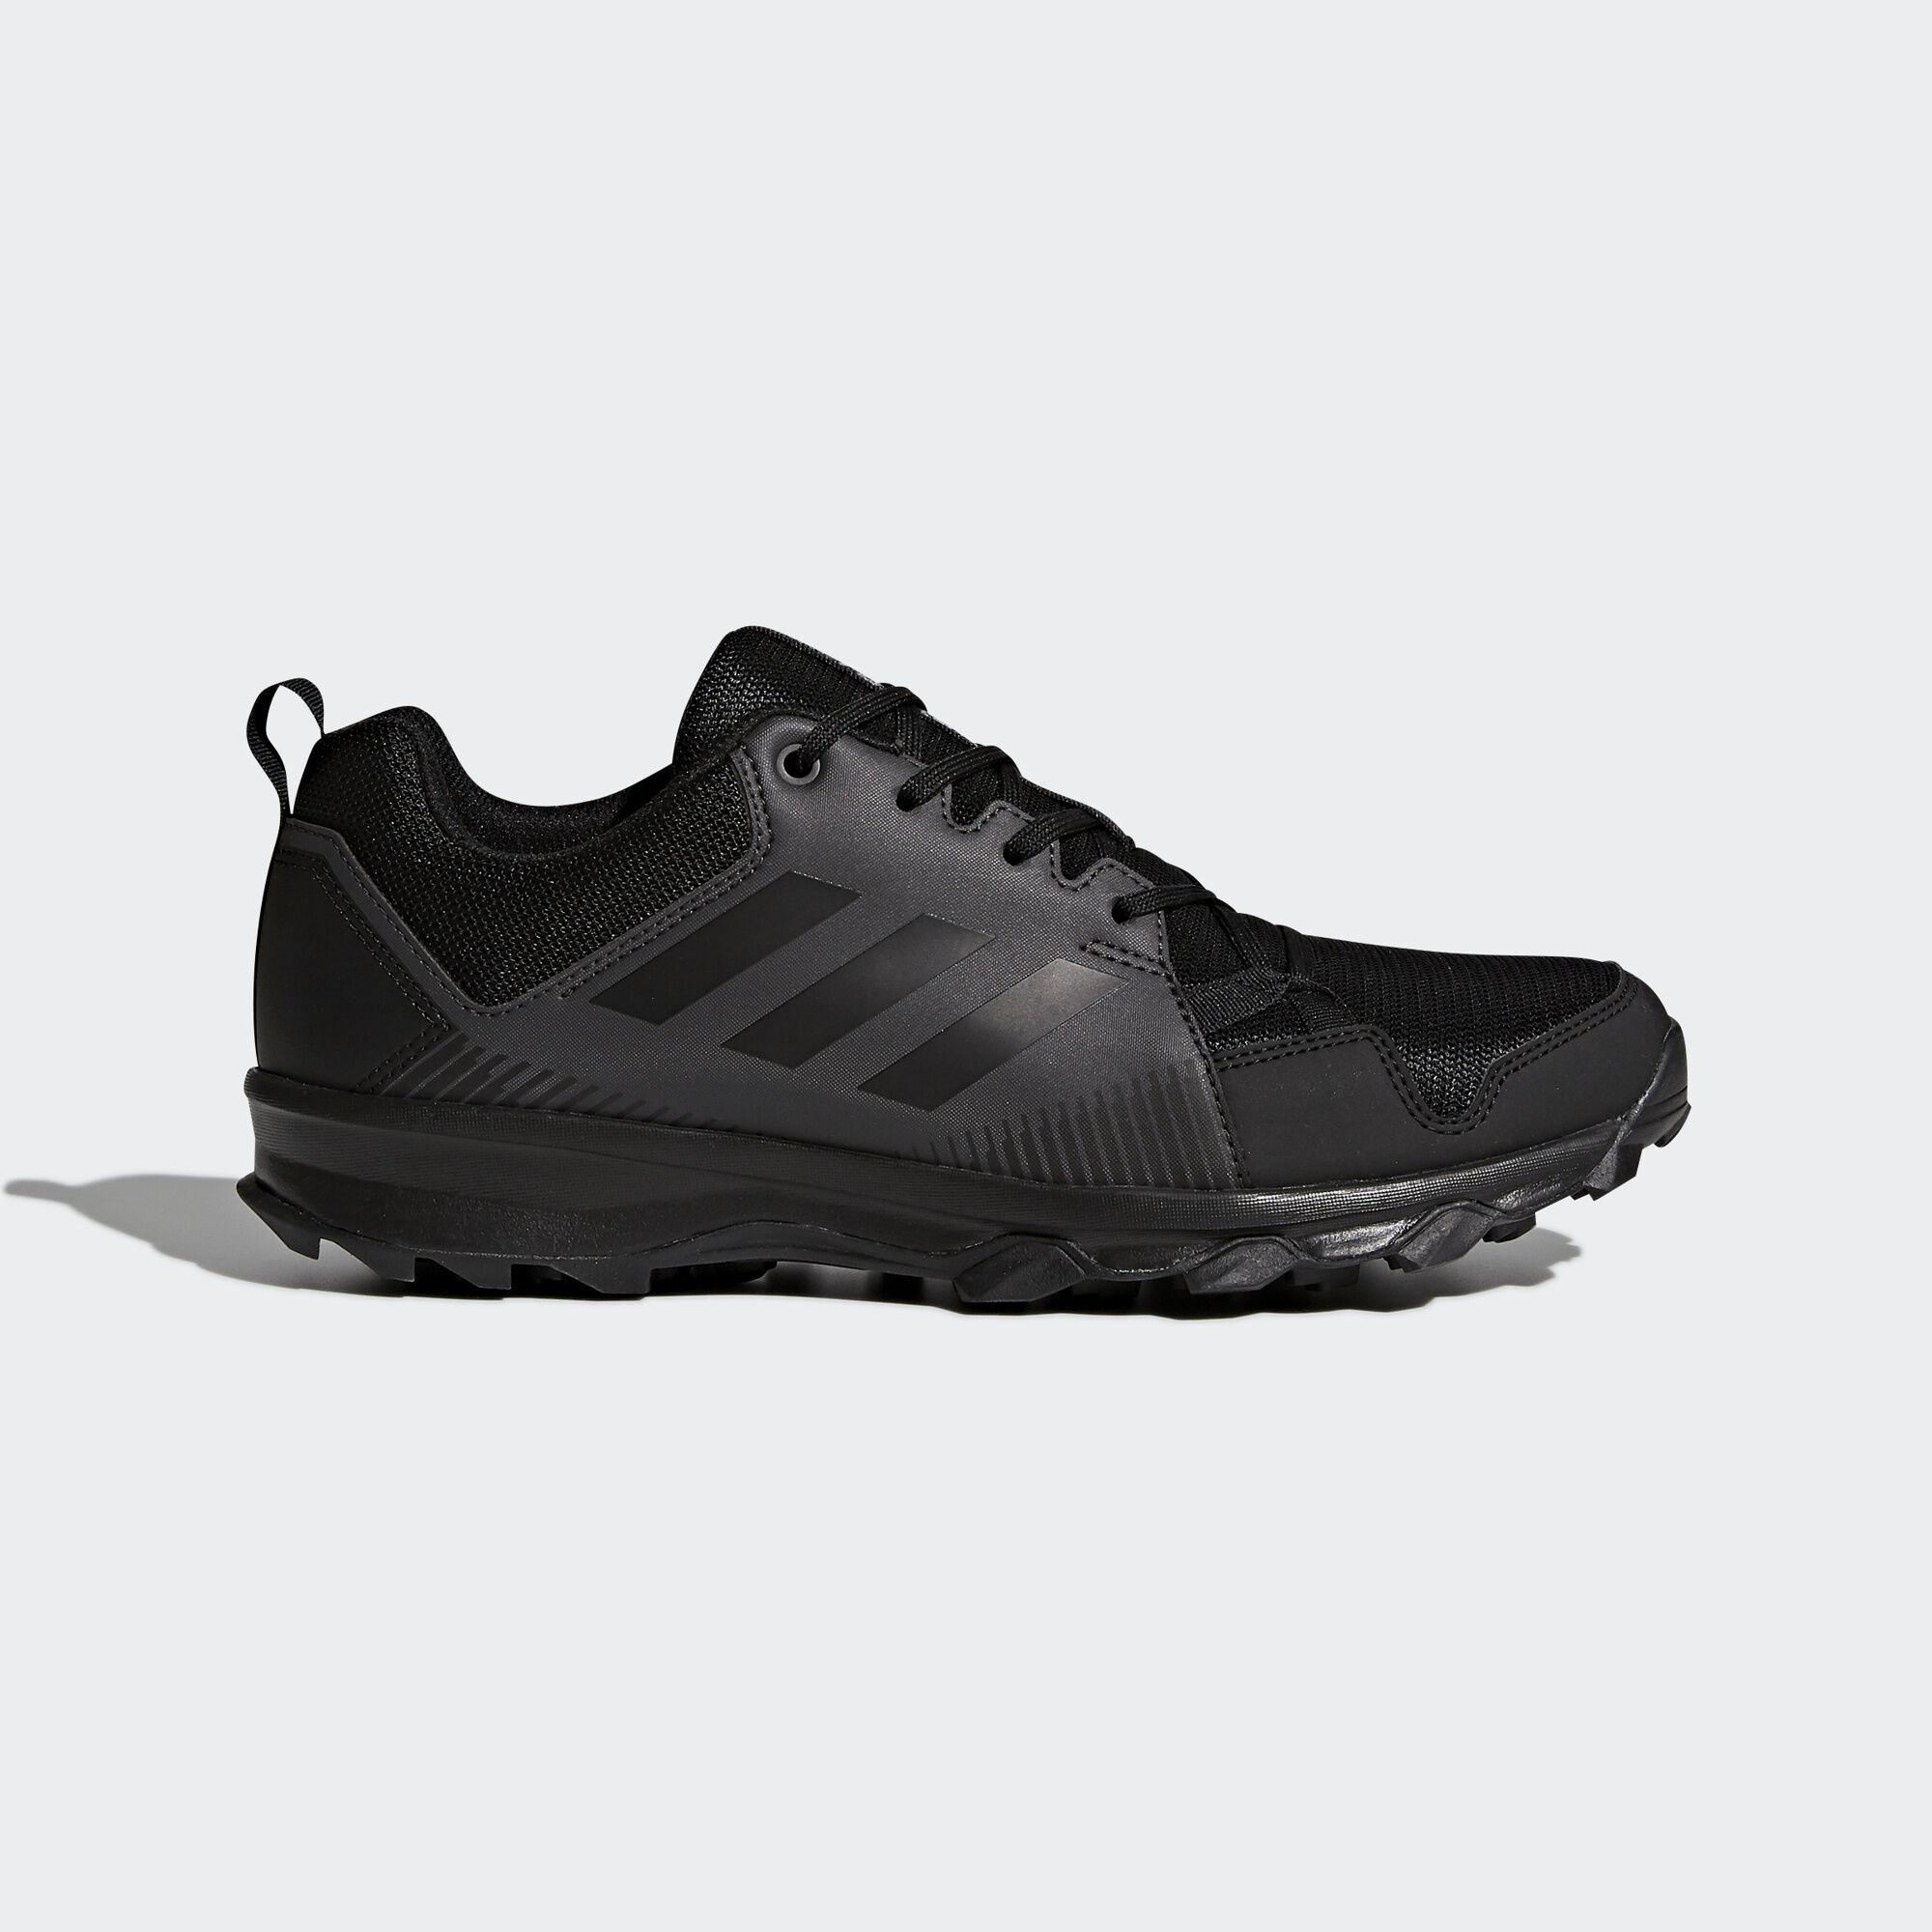 Adidas Terrex Tracerocker all black outdoor Shoes